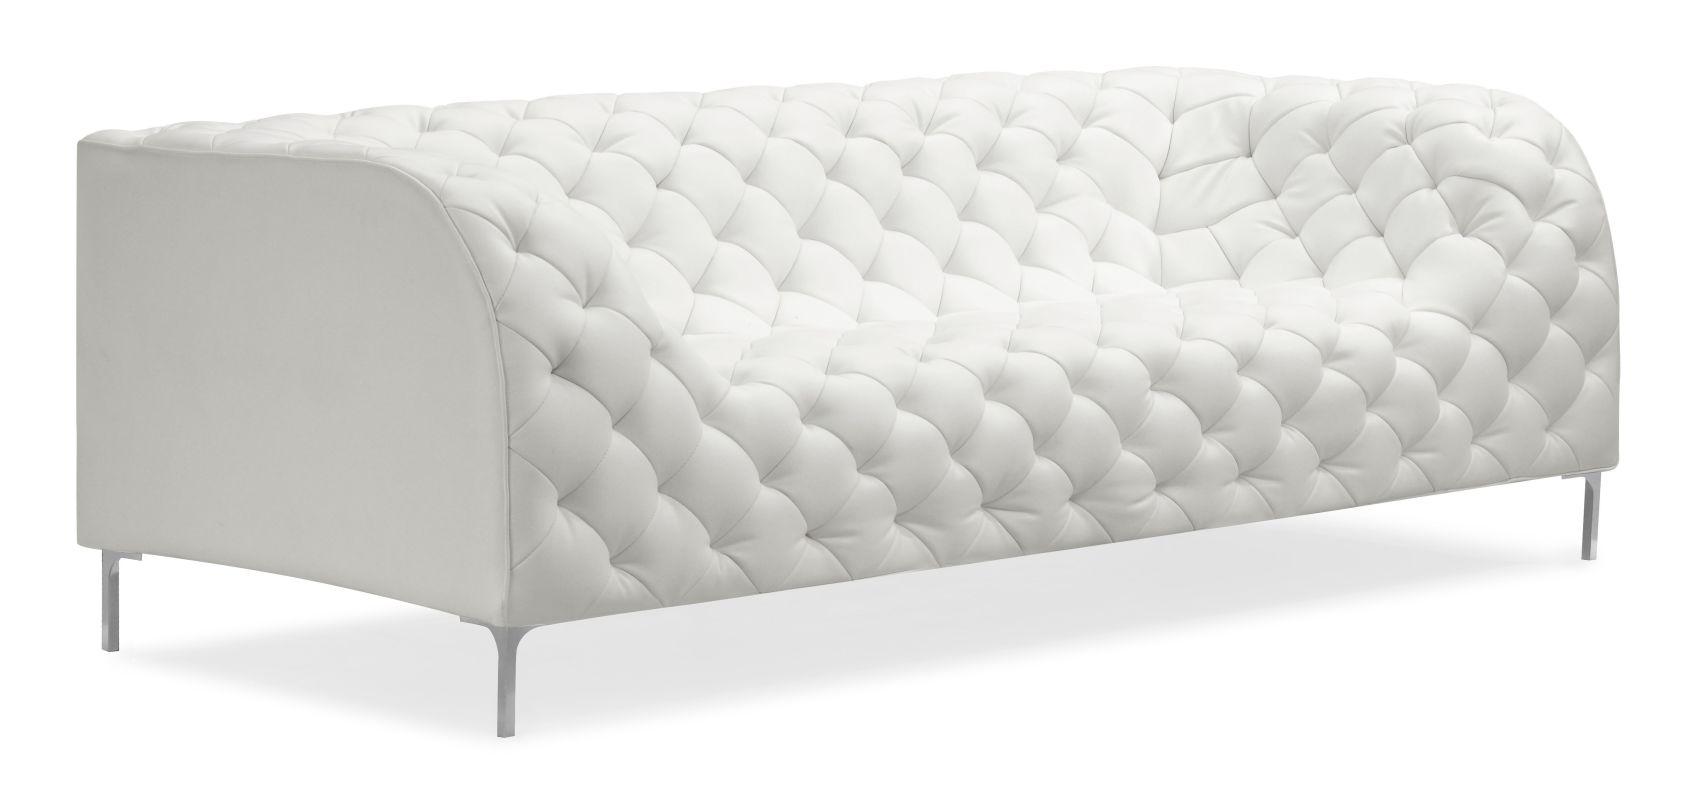 Zuo Modern Providence Sofa Providence Sofa White Furniture Sofas